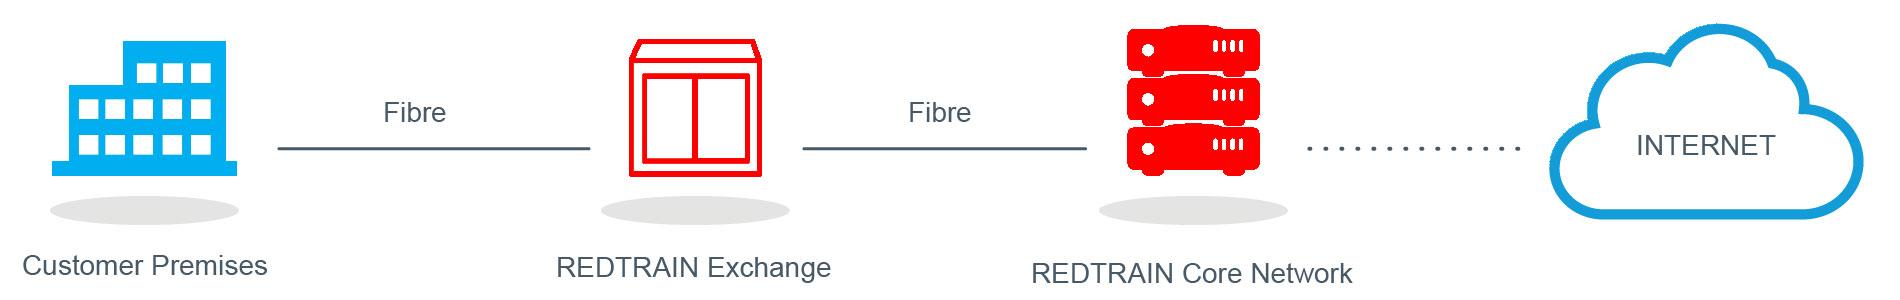 REDTRAIN Networks